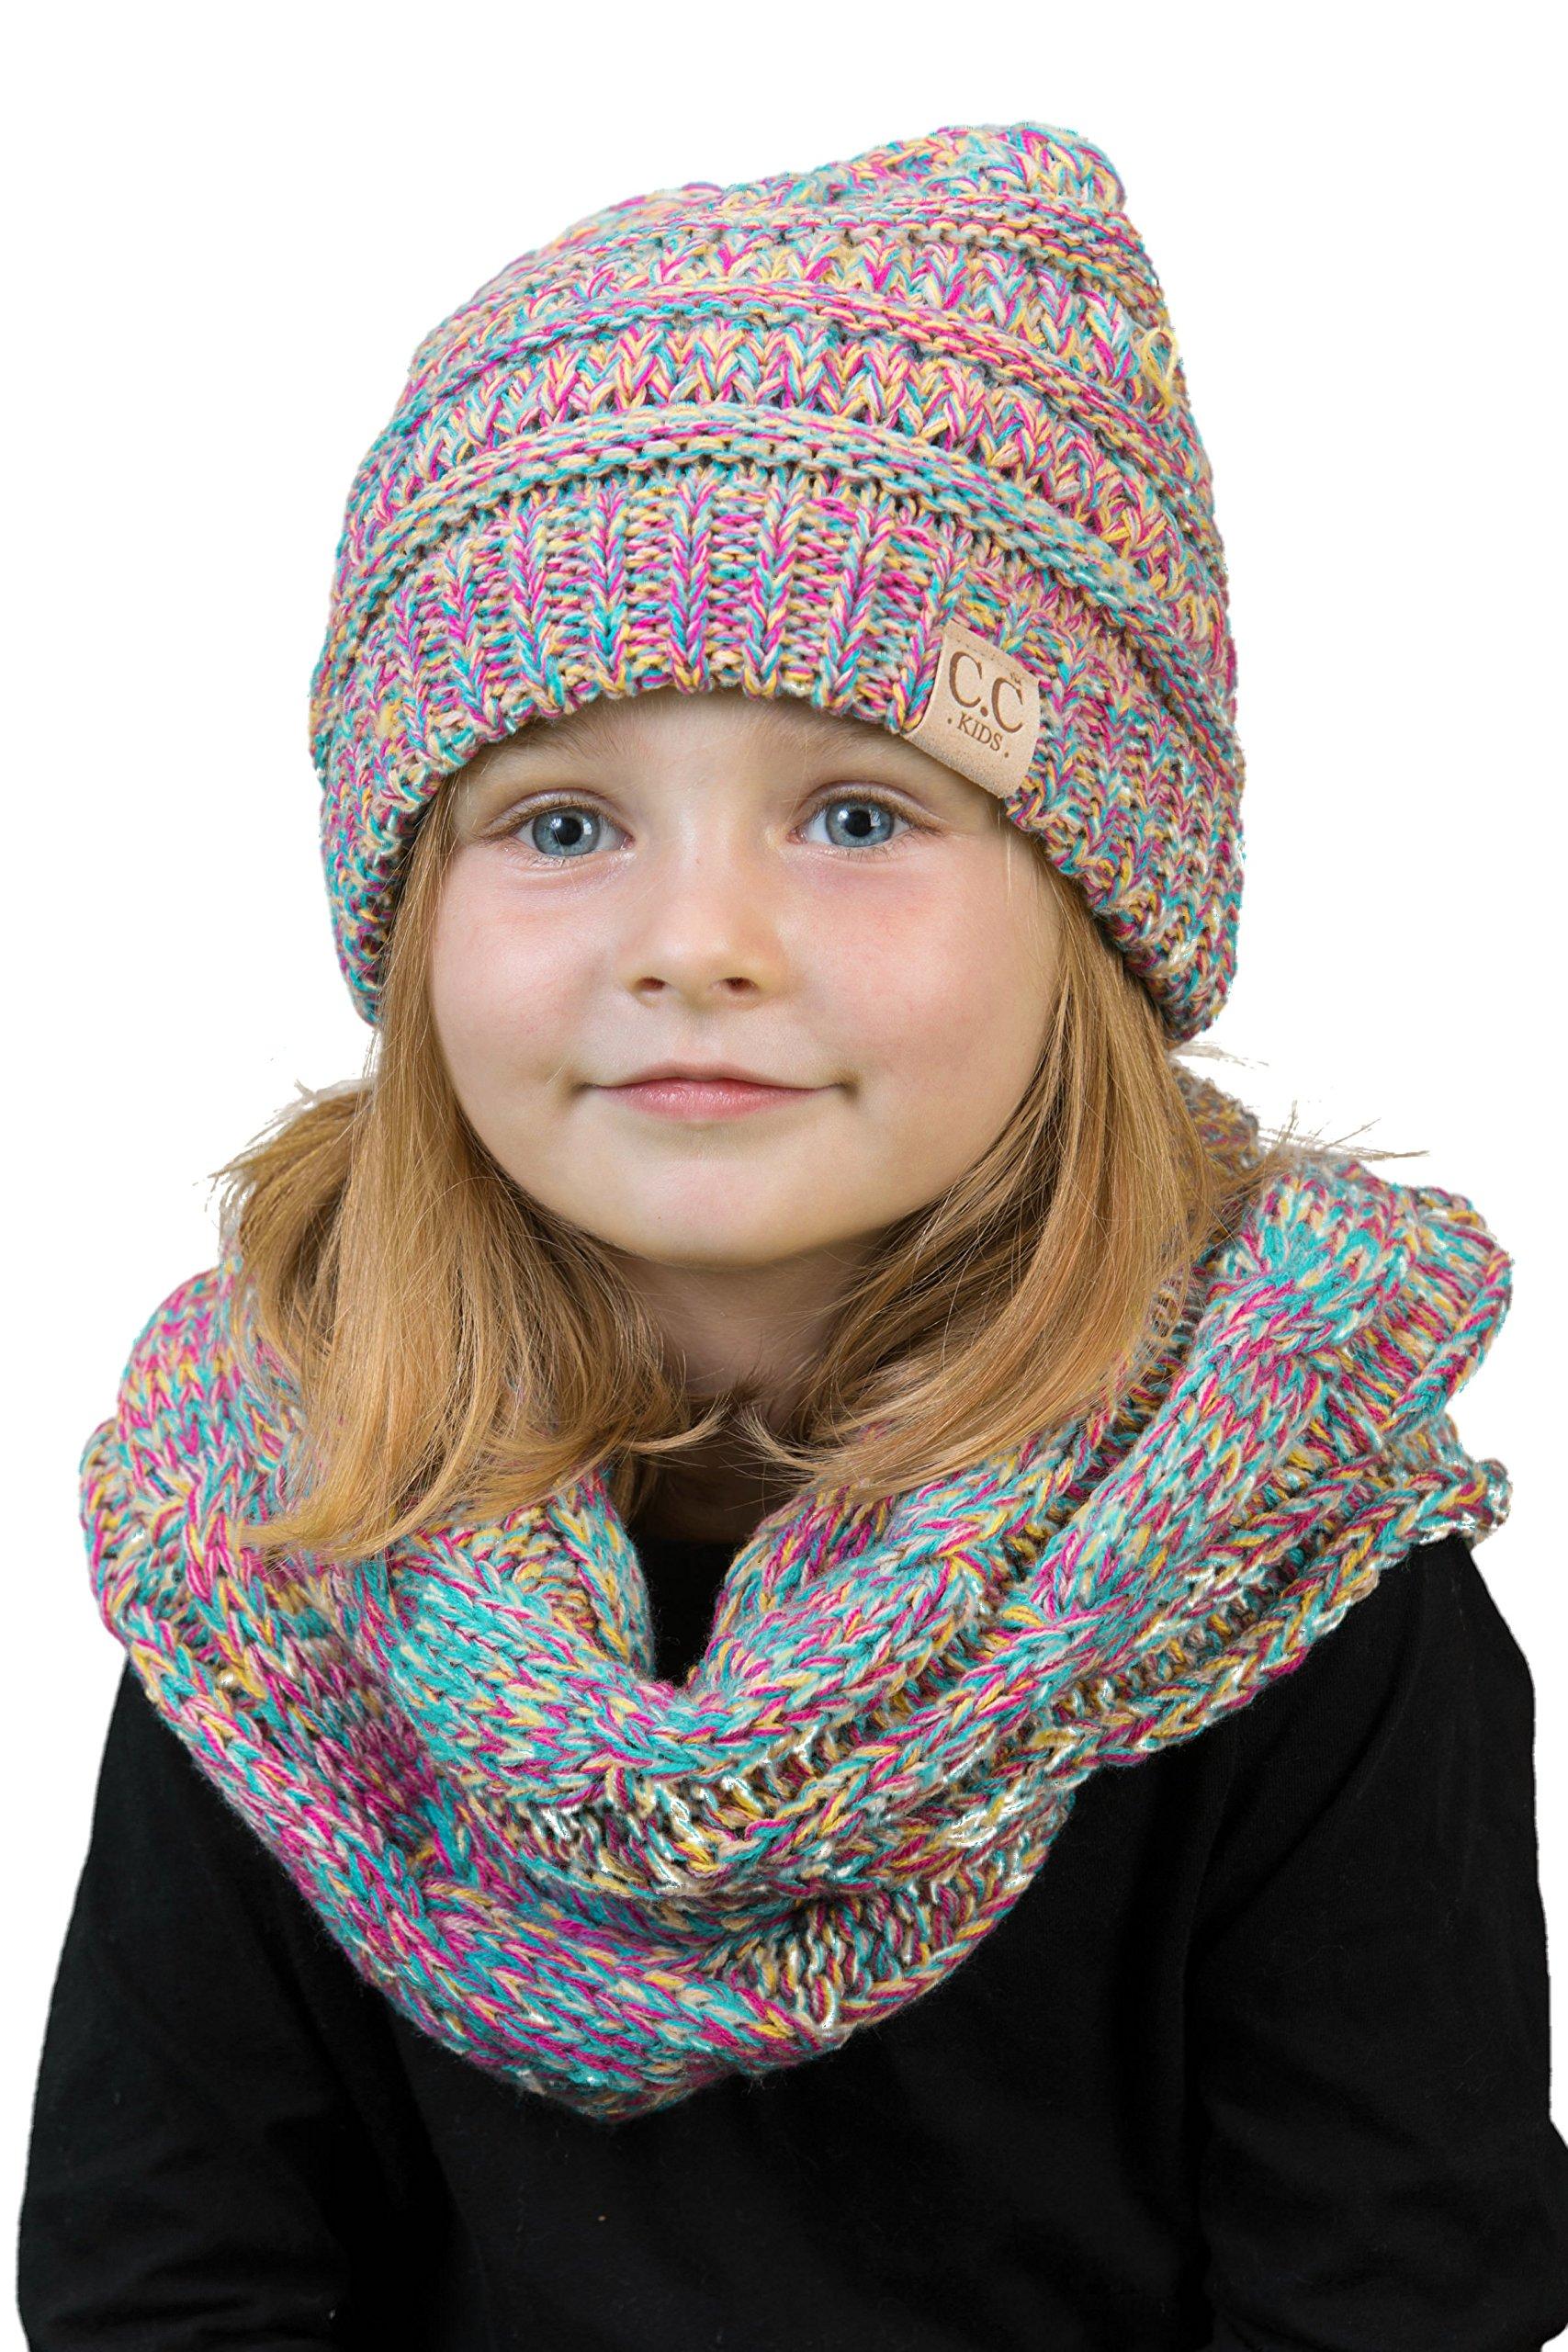 e5e04038a Funky Junque Girls Boys Infinity Scarf Matching Hat Beanie Tail Headwrap  Bundle | Jodyshop